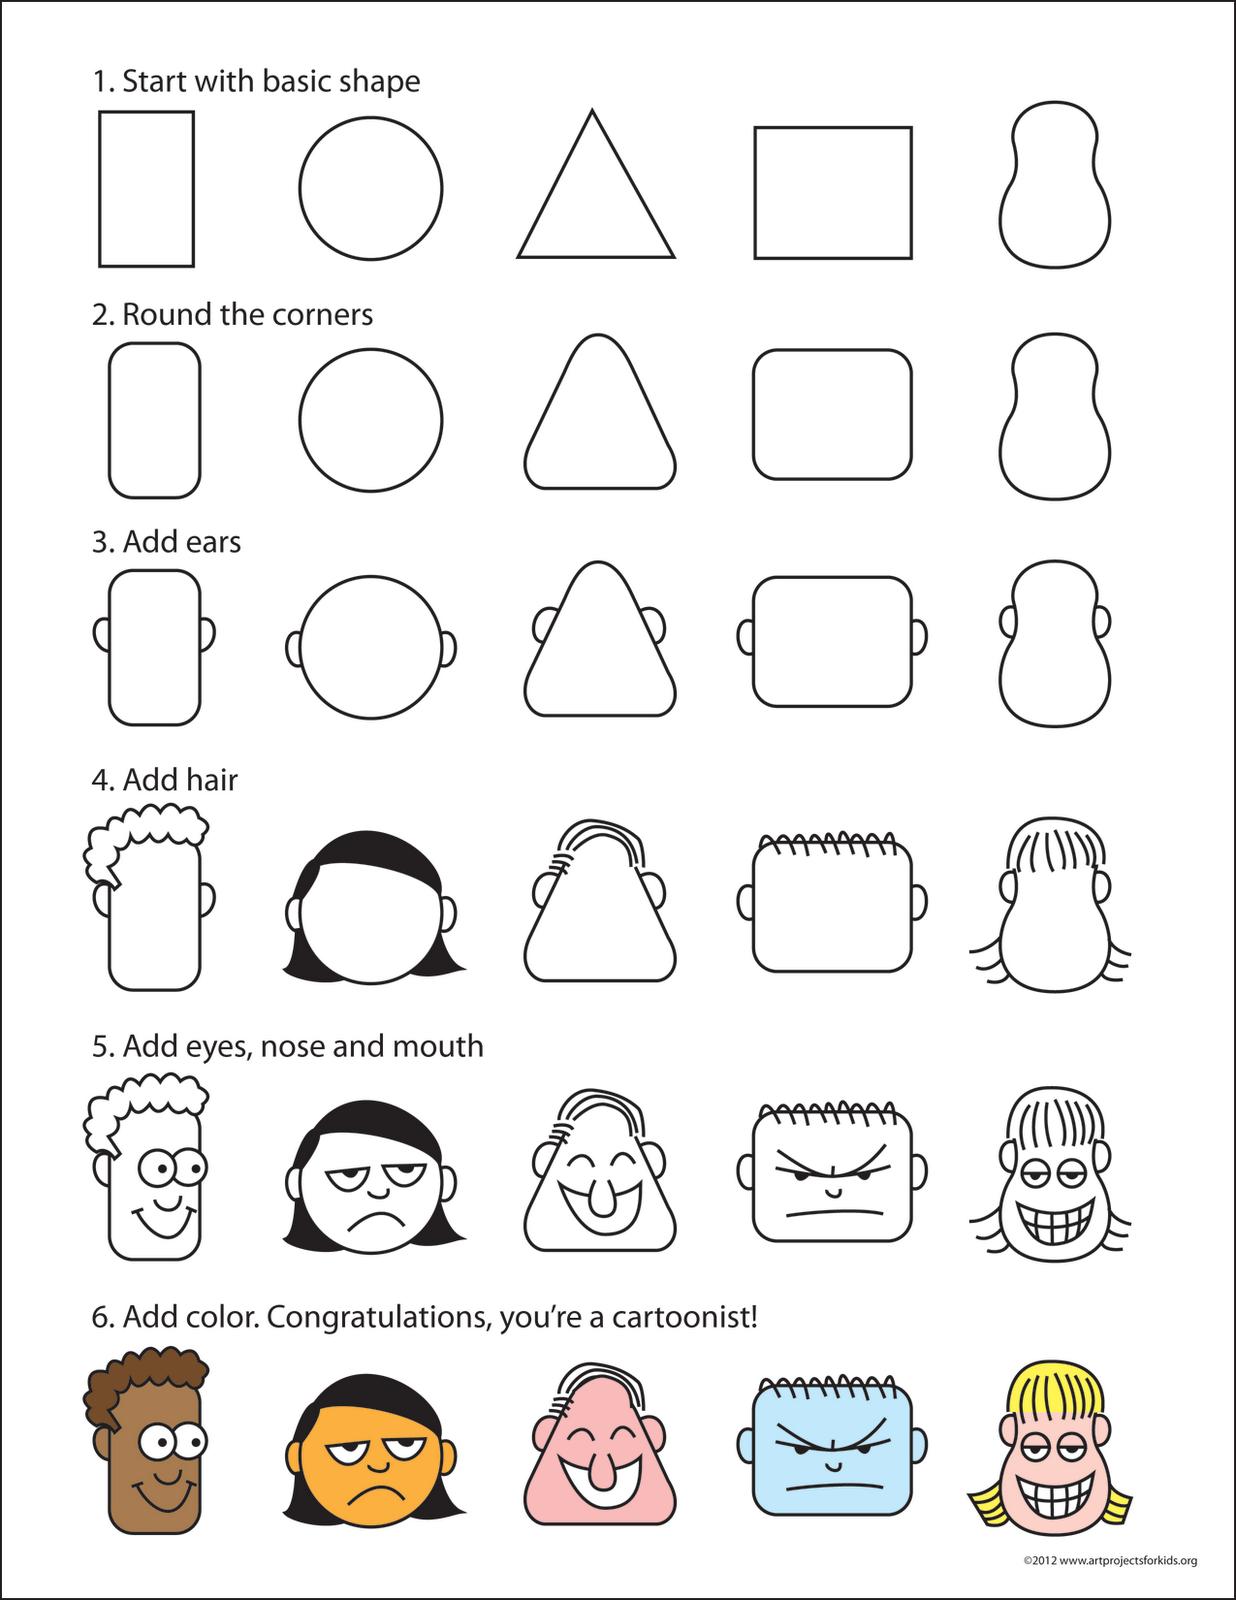 Como Dibujar Caras